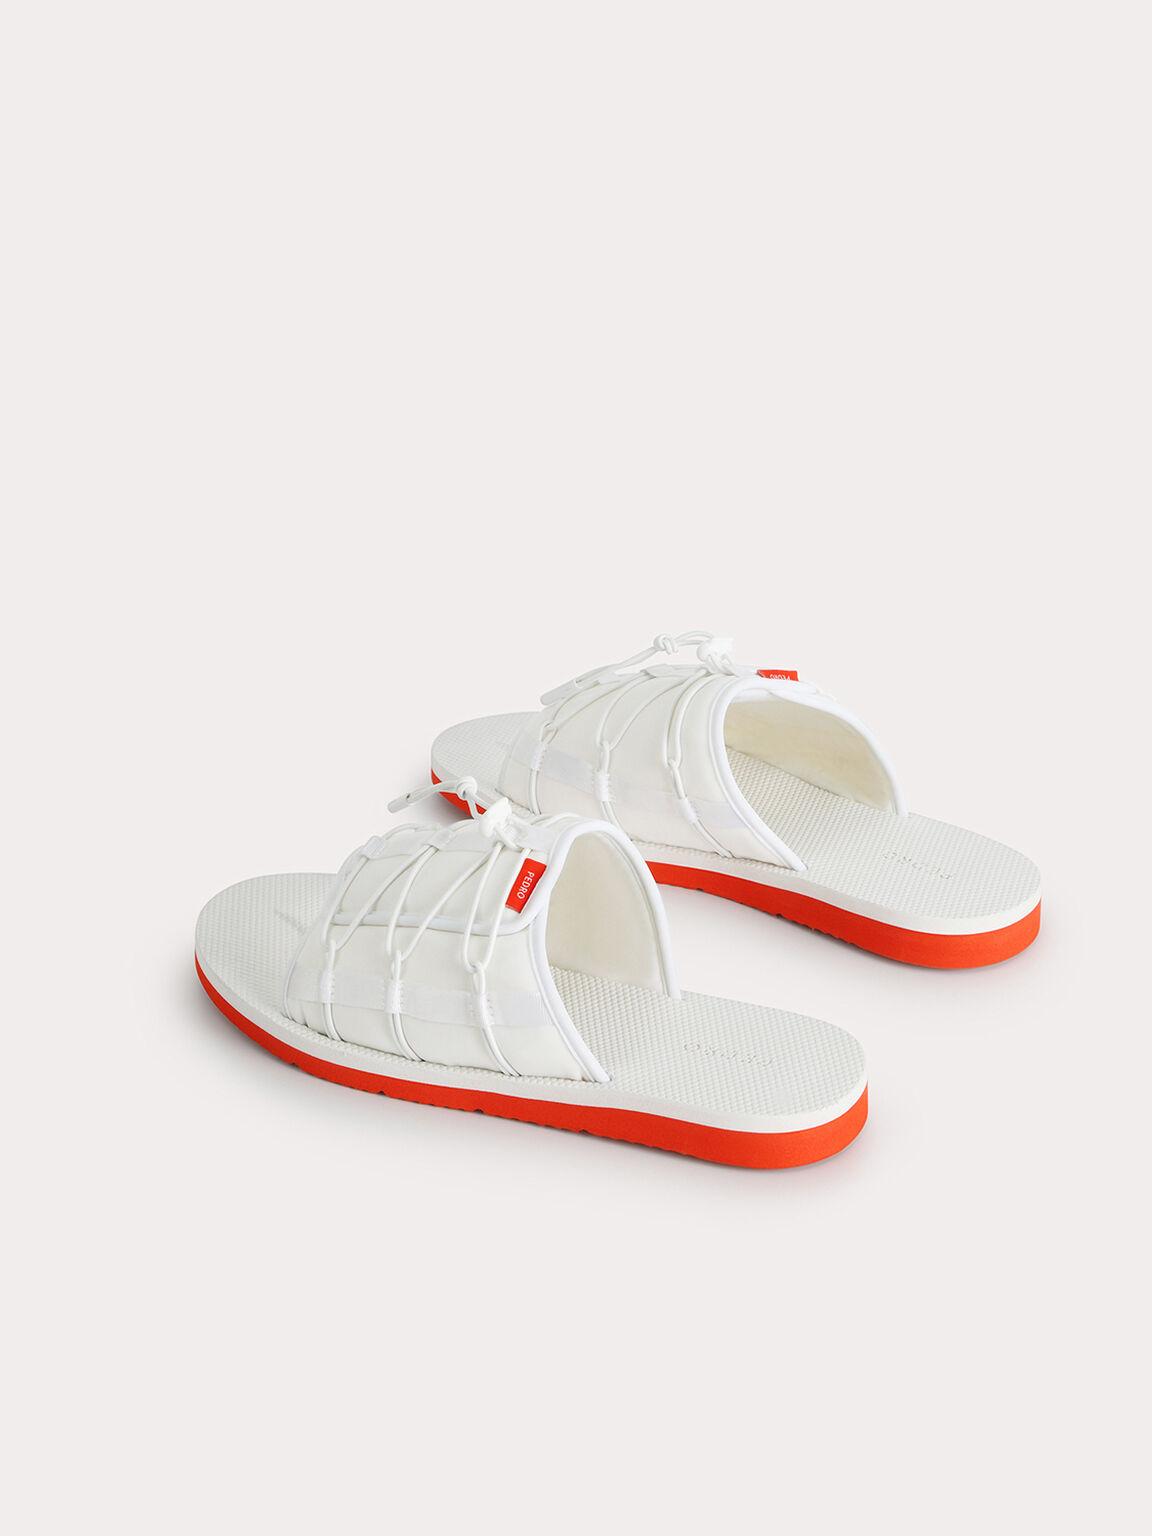 Nylon Slip-On Sandals, White, hi-res